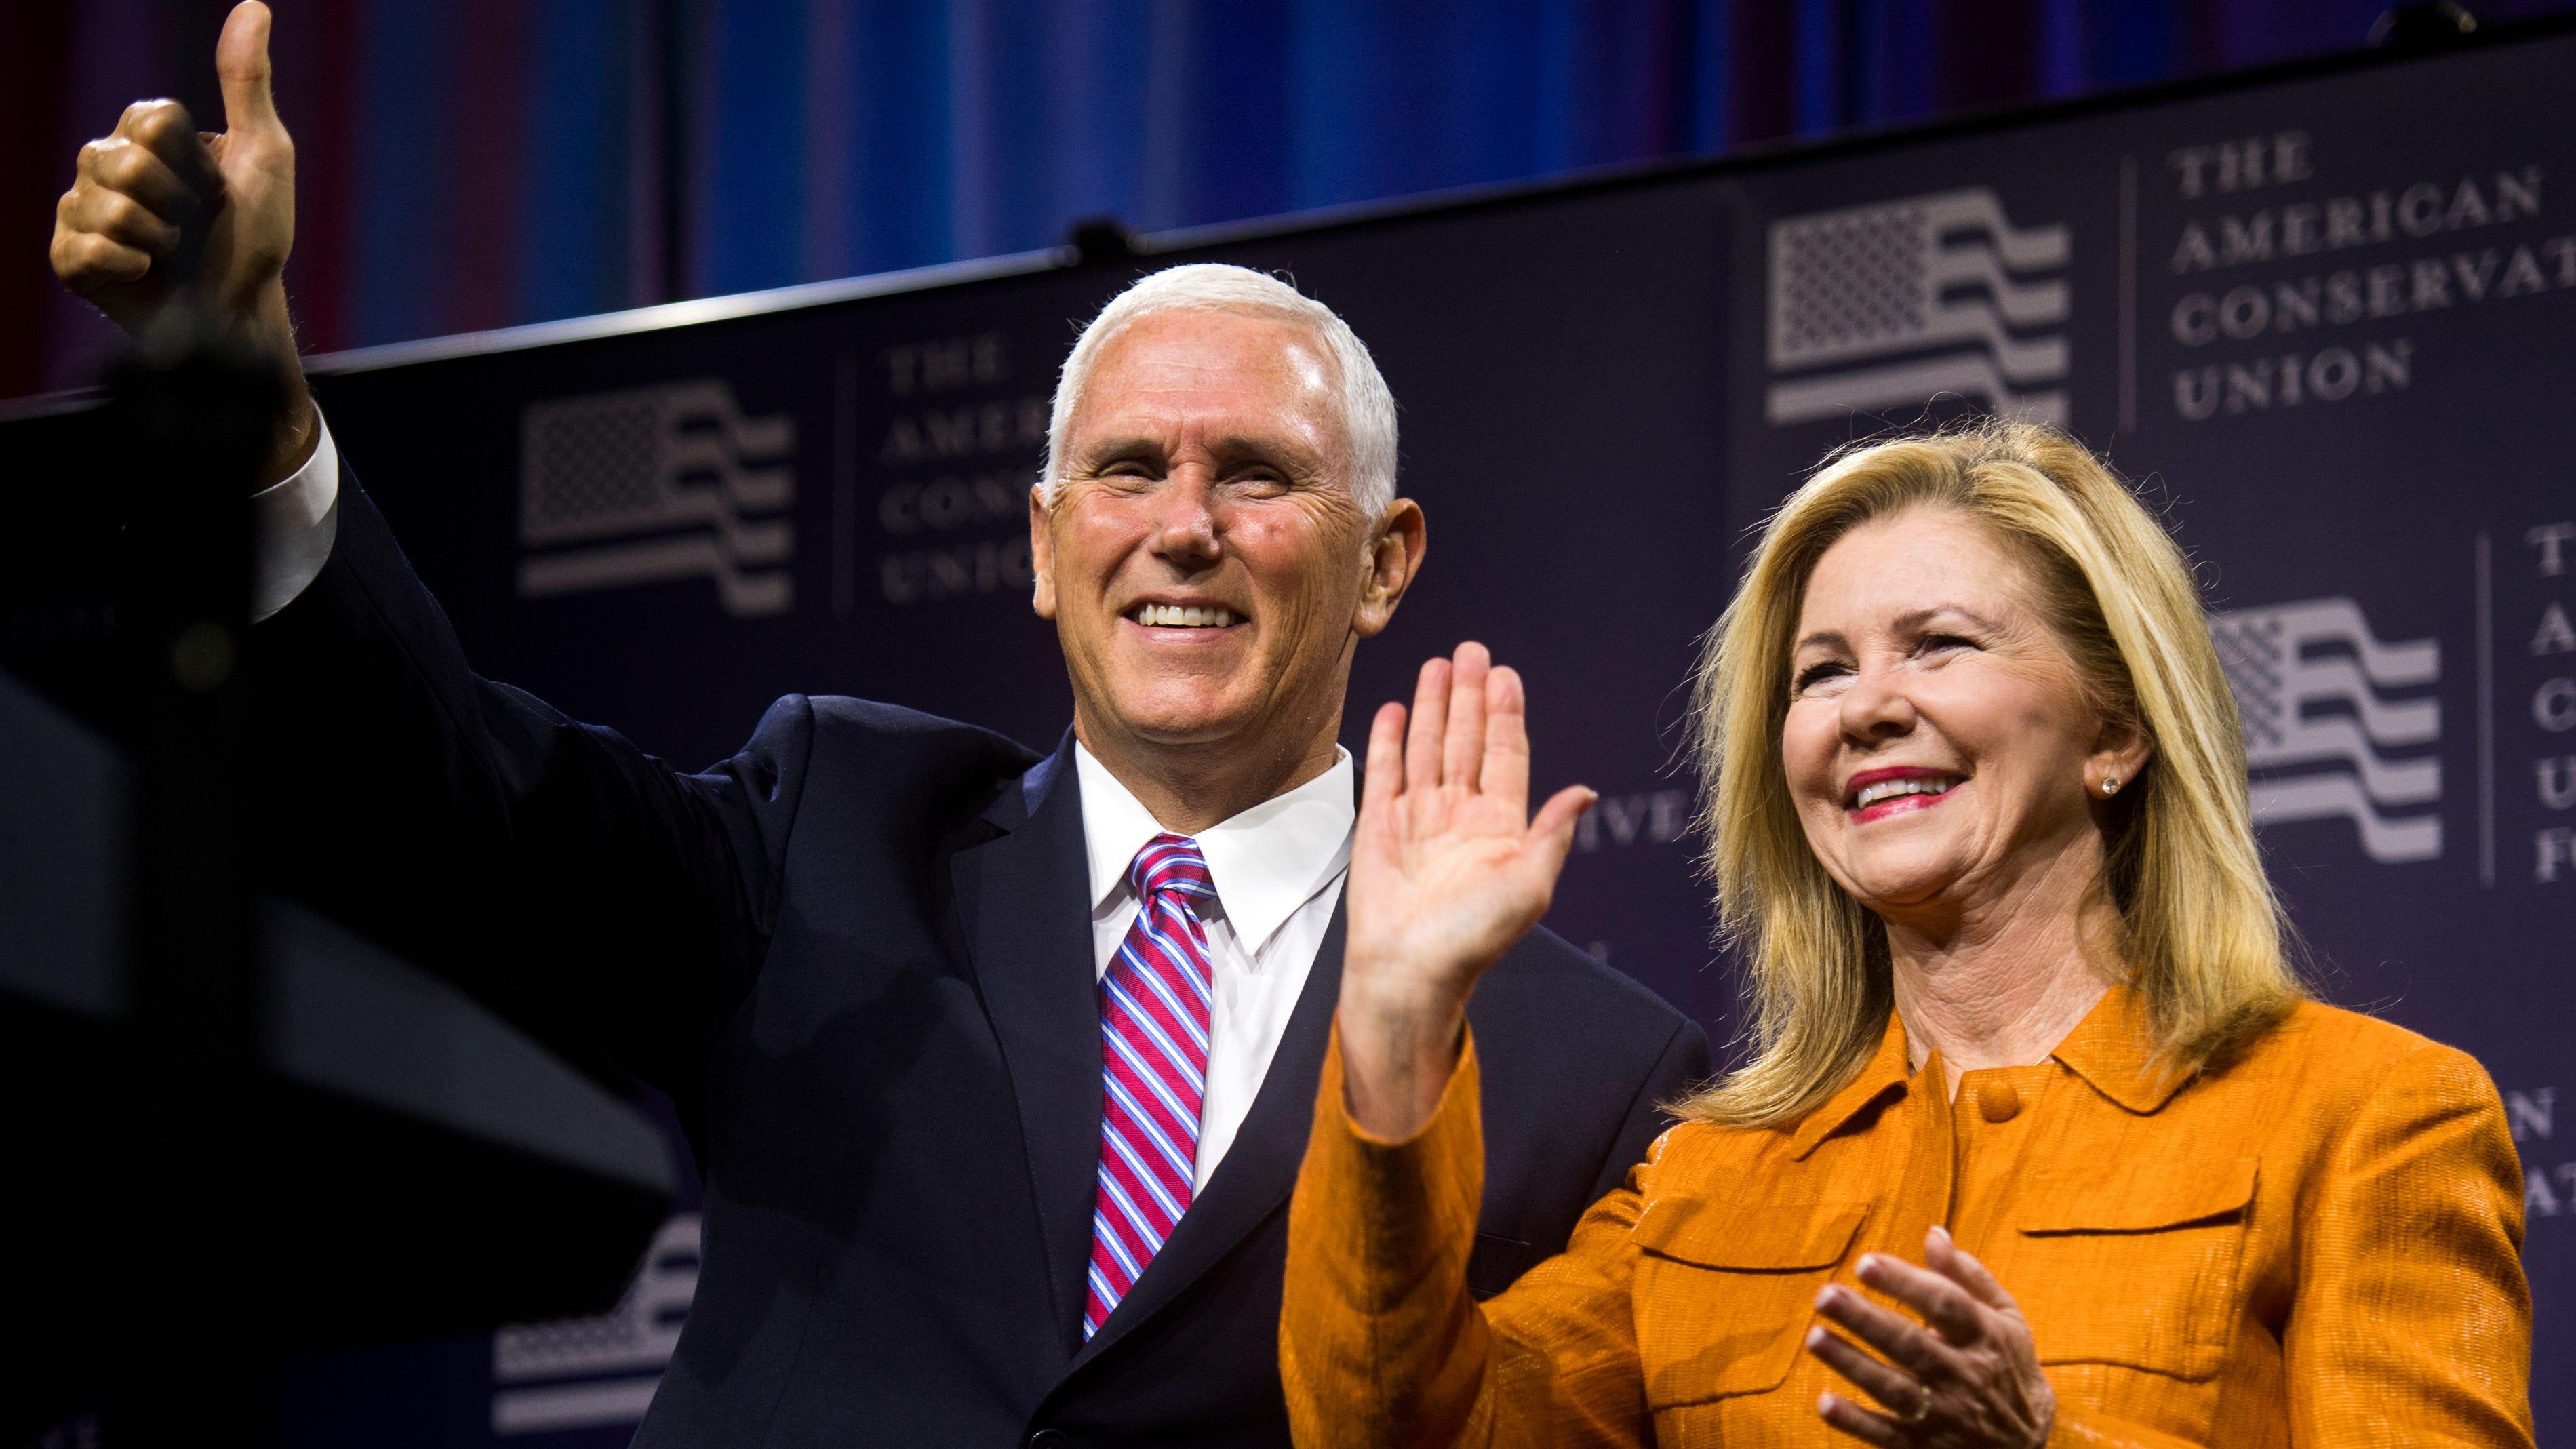 Vice President Pence, GOP leaders stump for Blackburn in Knoxville visit